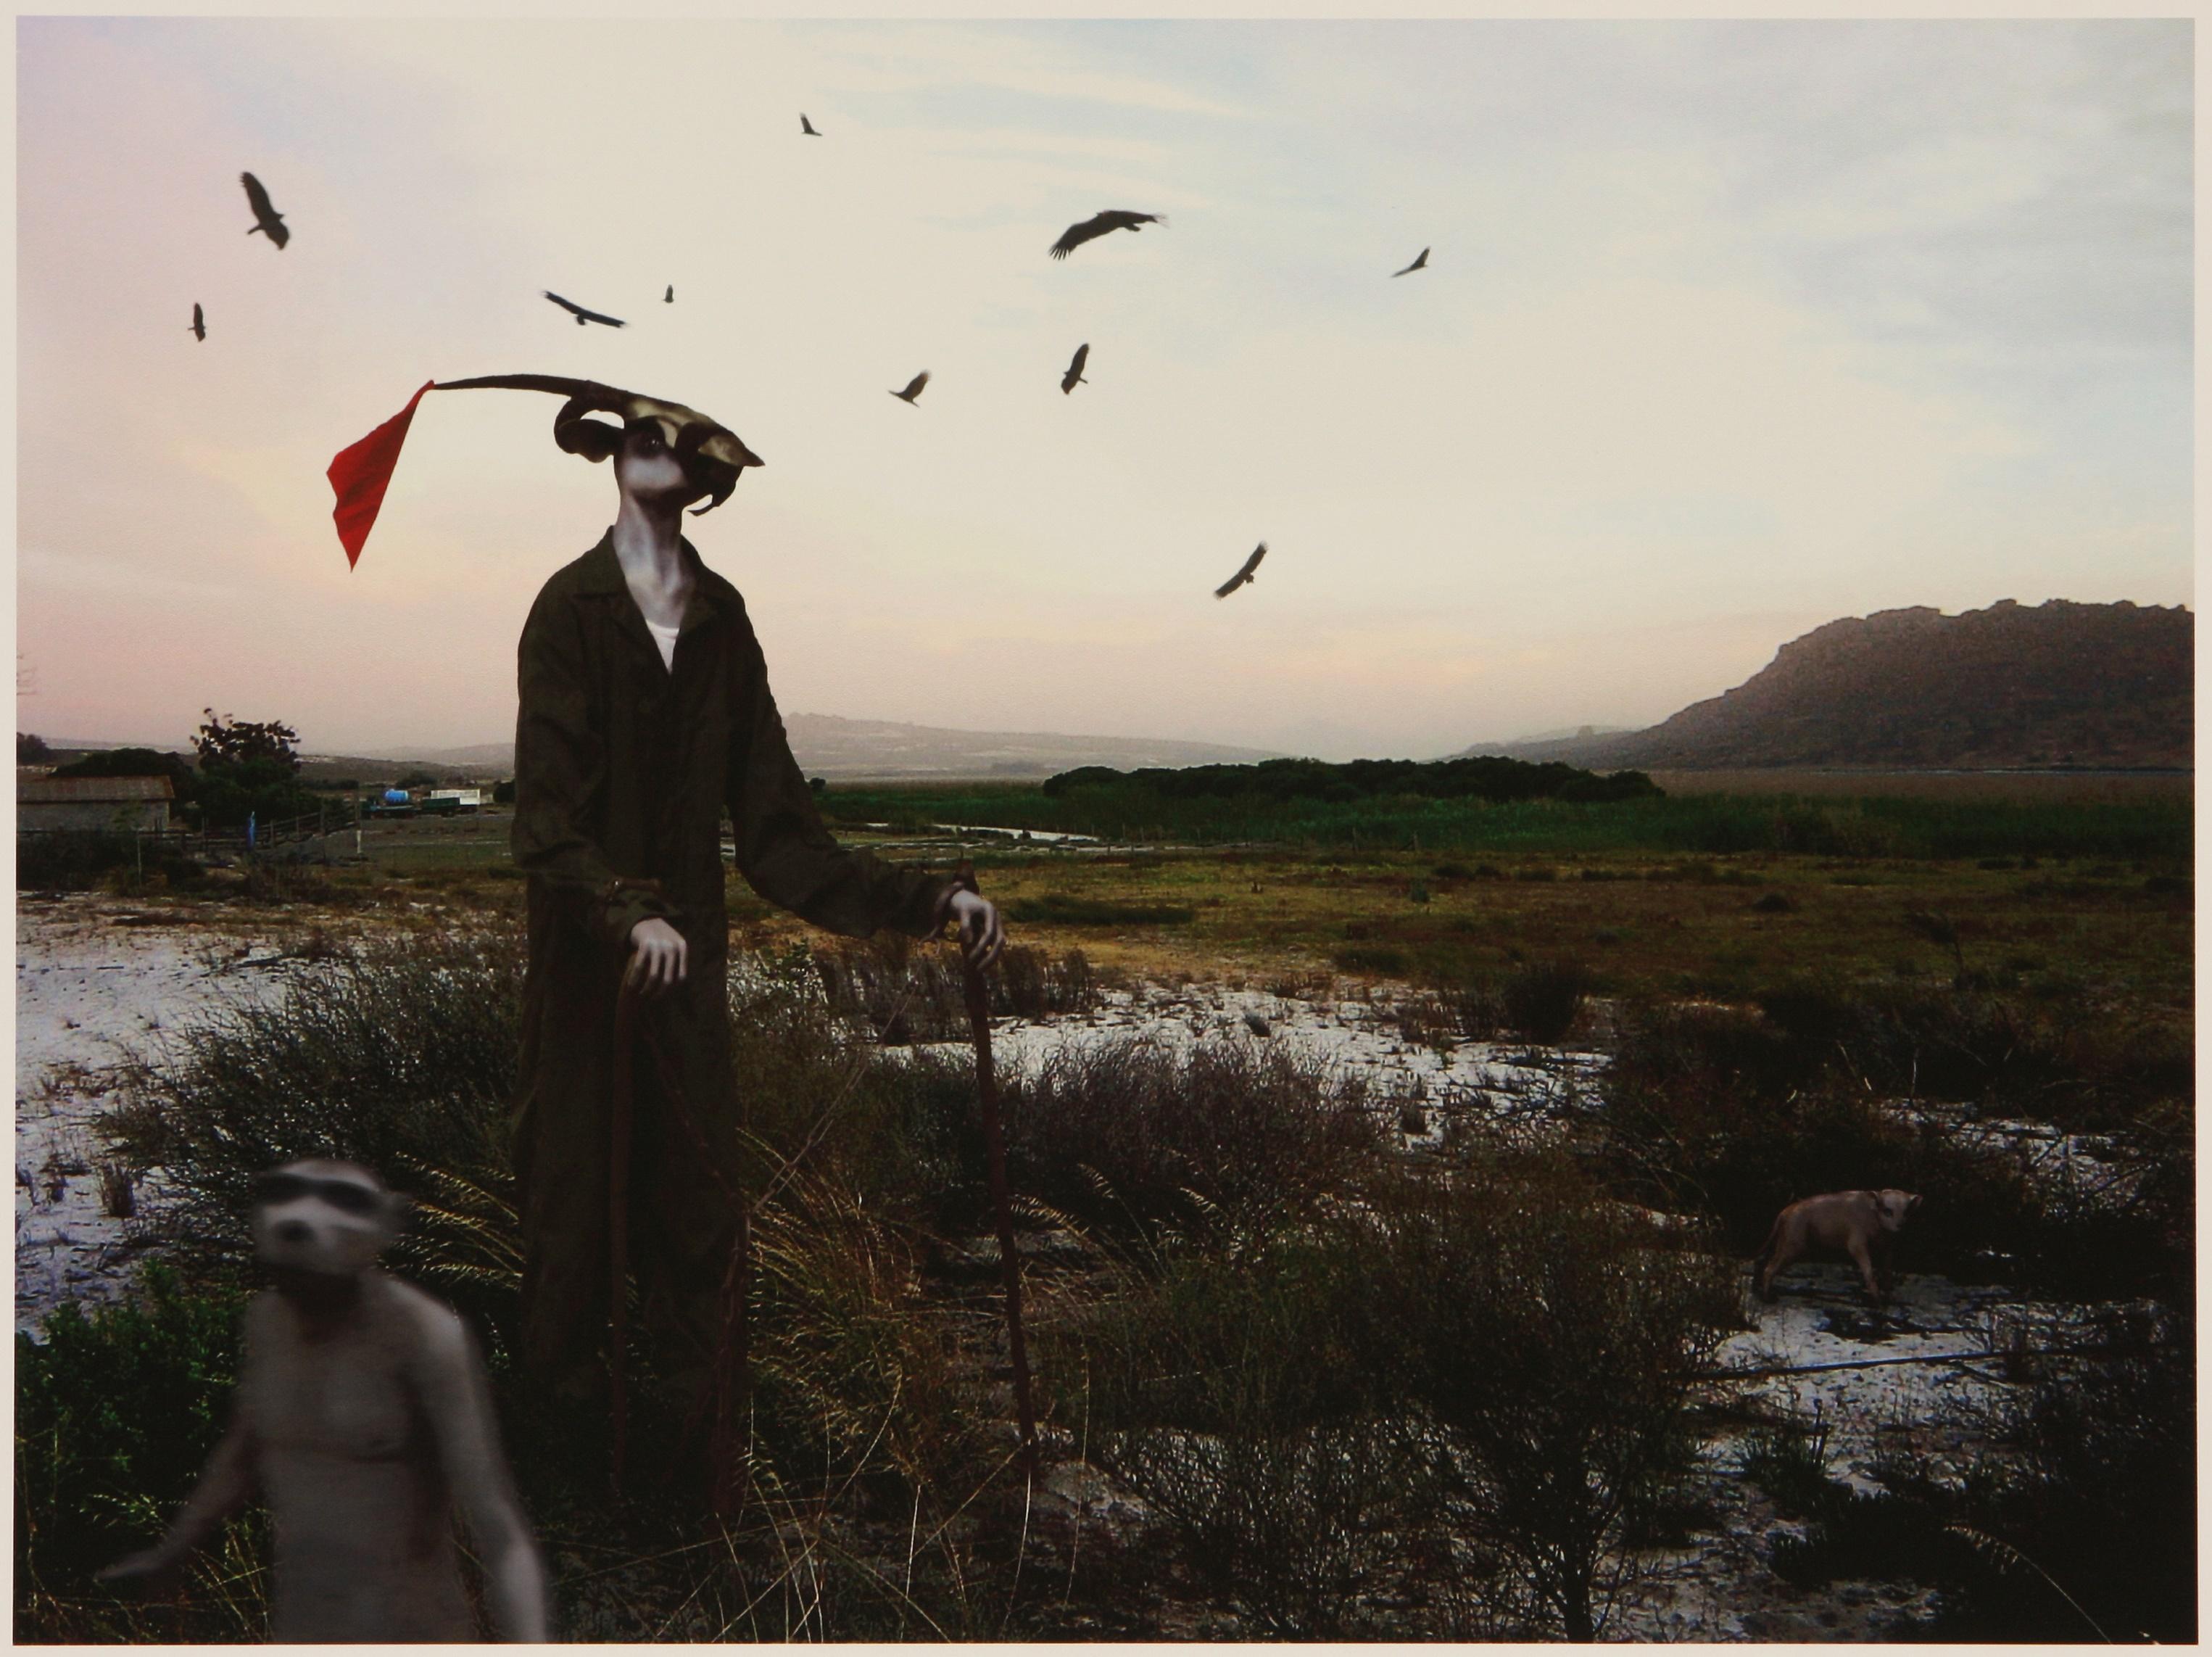 Jane Alexander (South Africa 1959-) Harbinger in Correctional Uniform, Lost Marsh, 2007